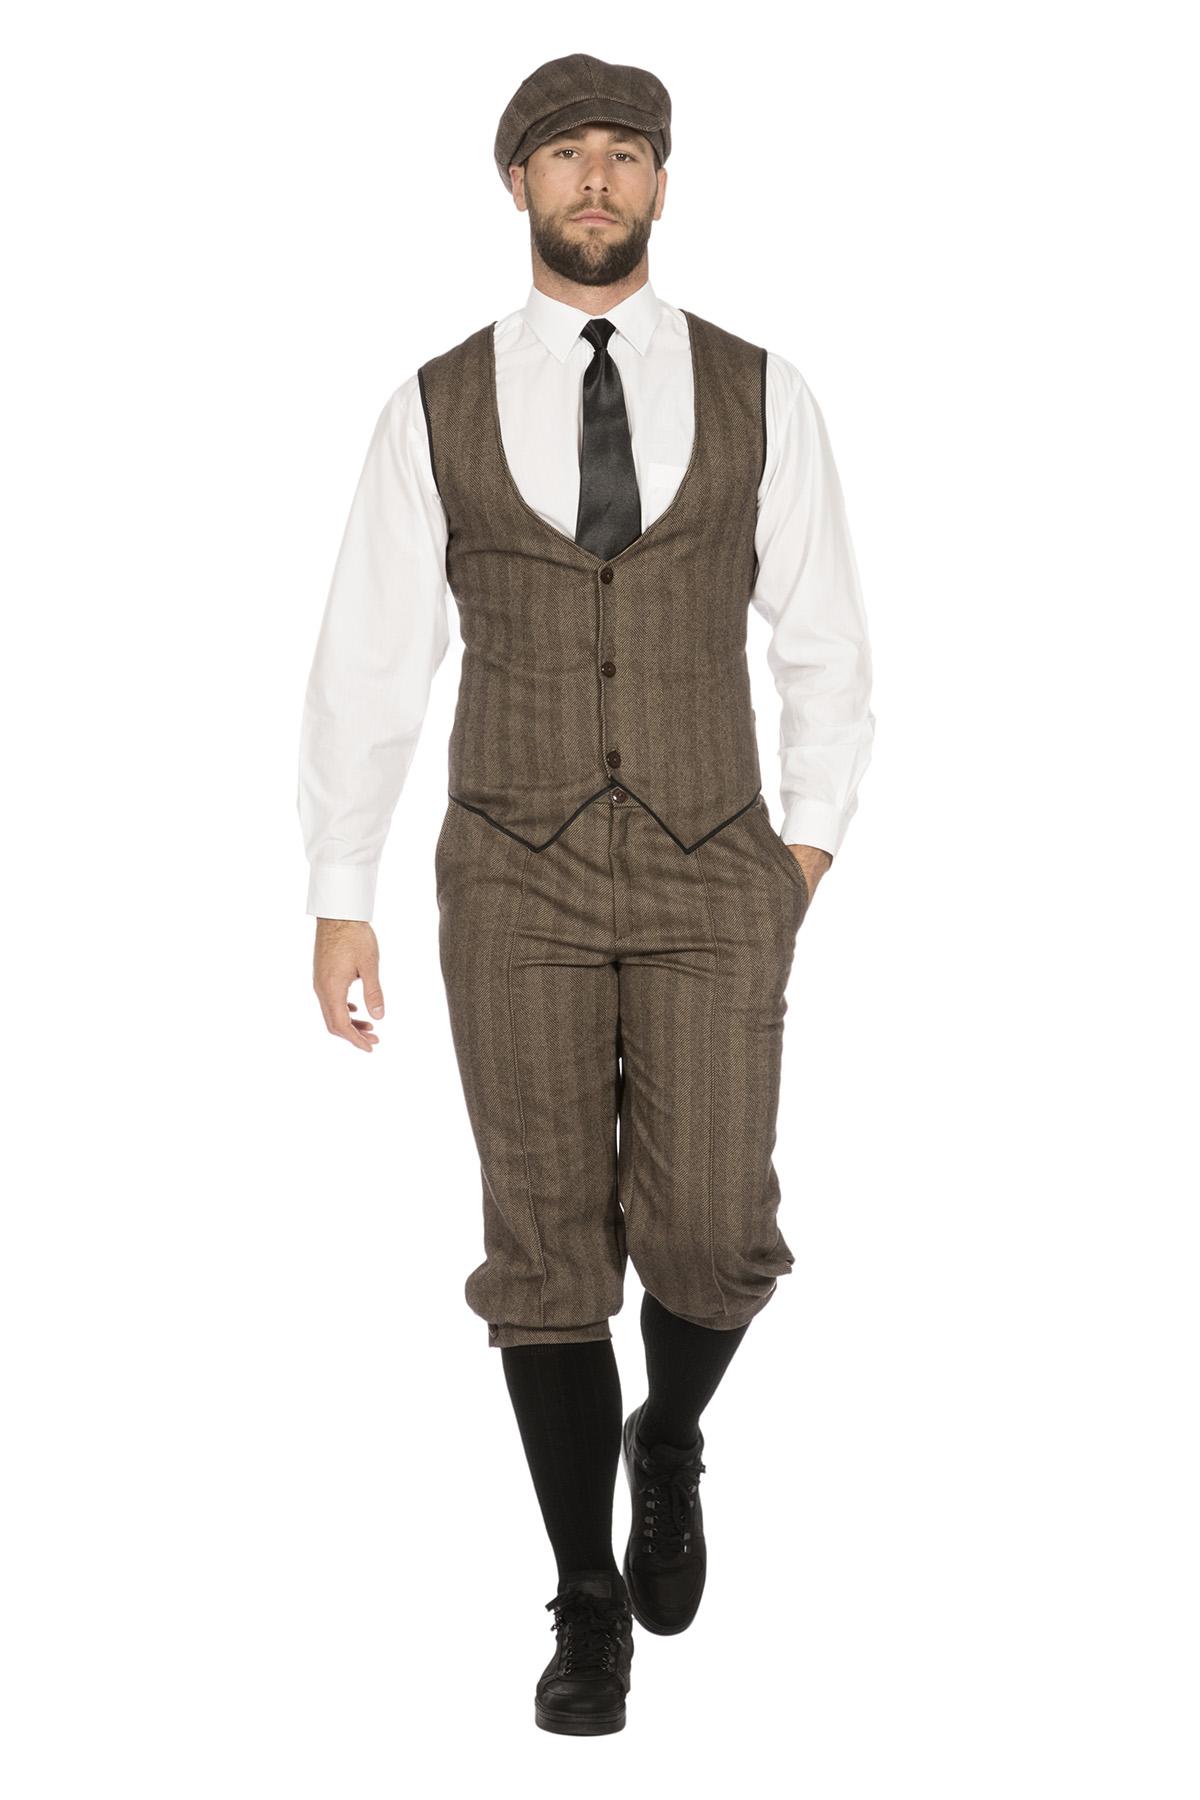 20er jahre peaky blinders anzug knickerbocker herren. Black Bedroom Furniture Sets. Home Design Ideas